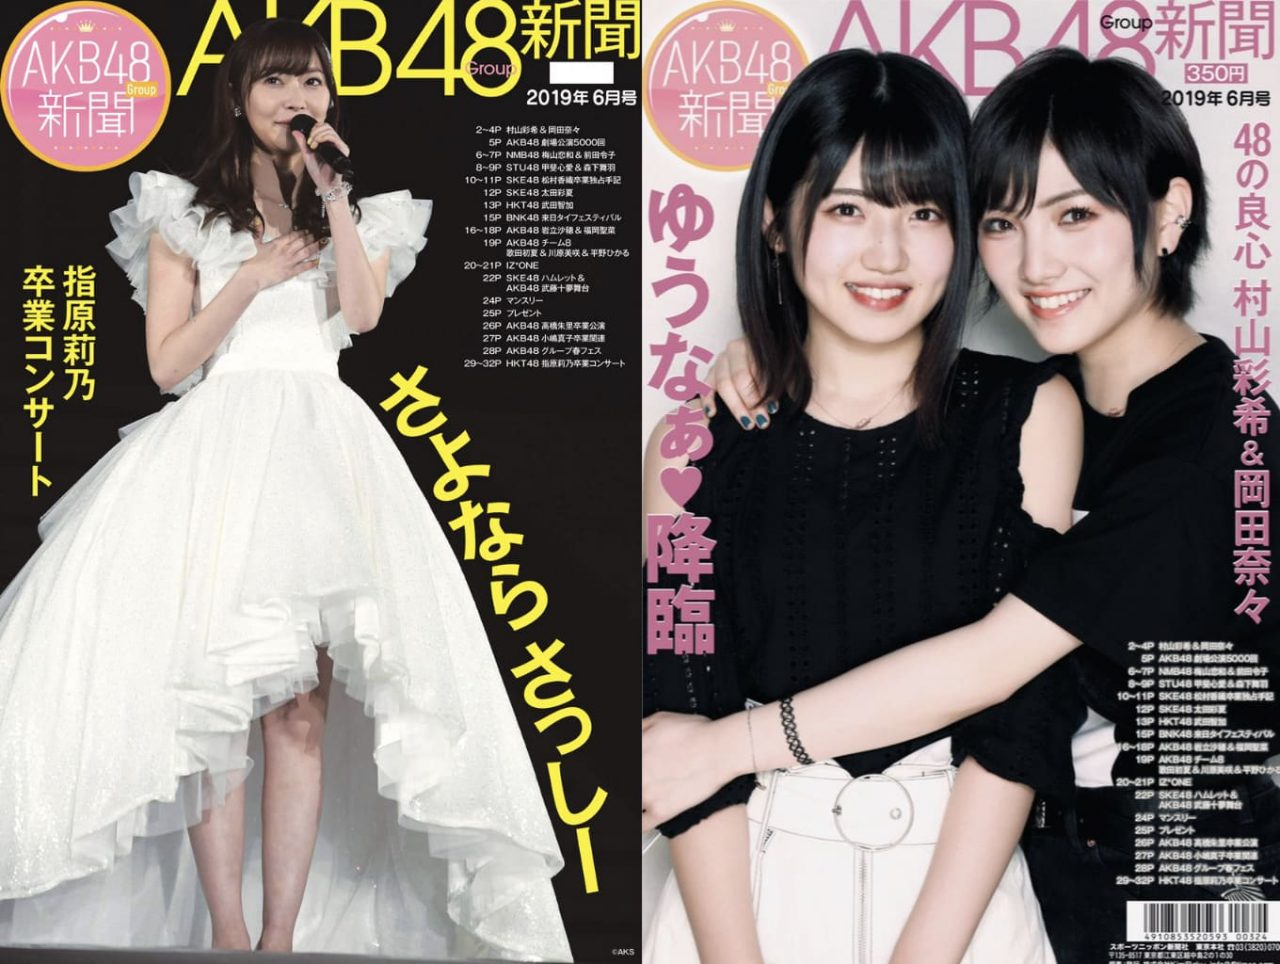 AKB48Group新聞 2019年6月号